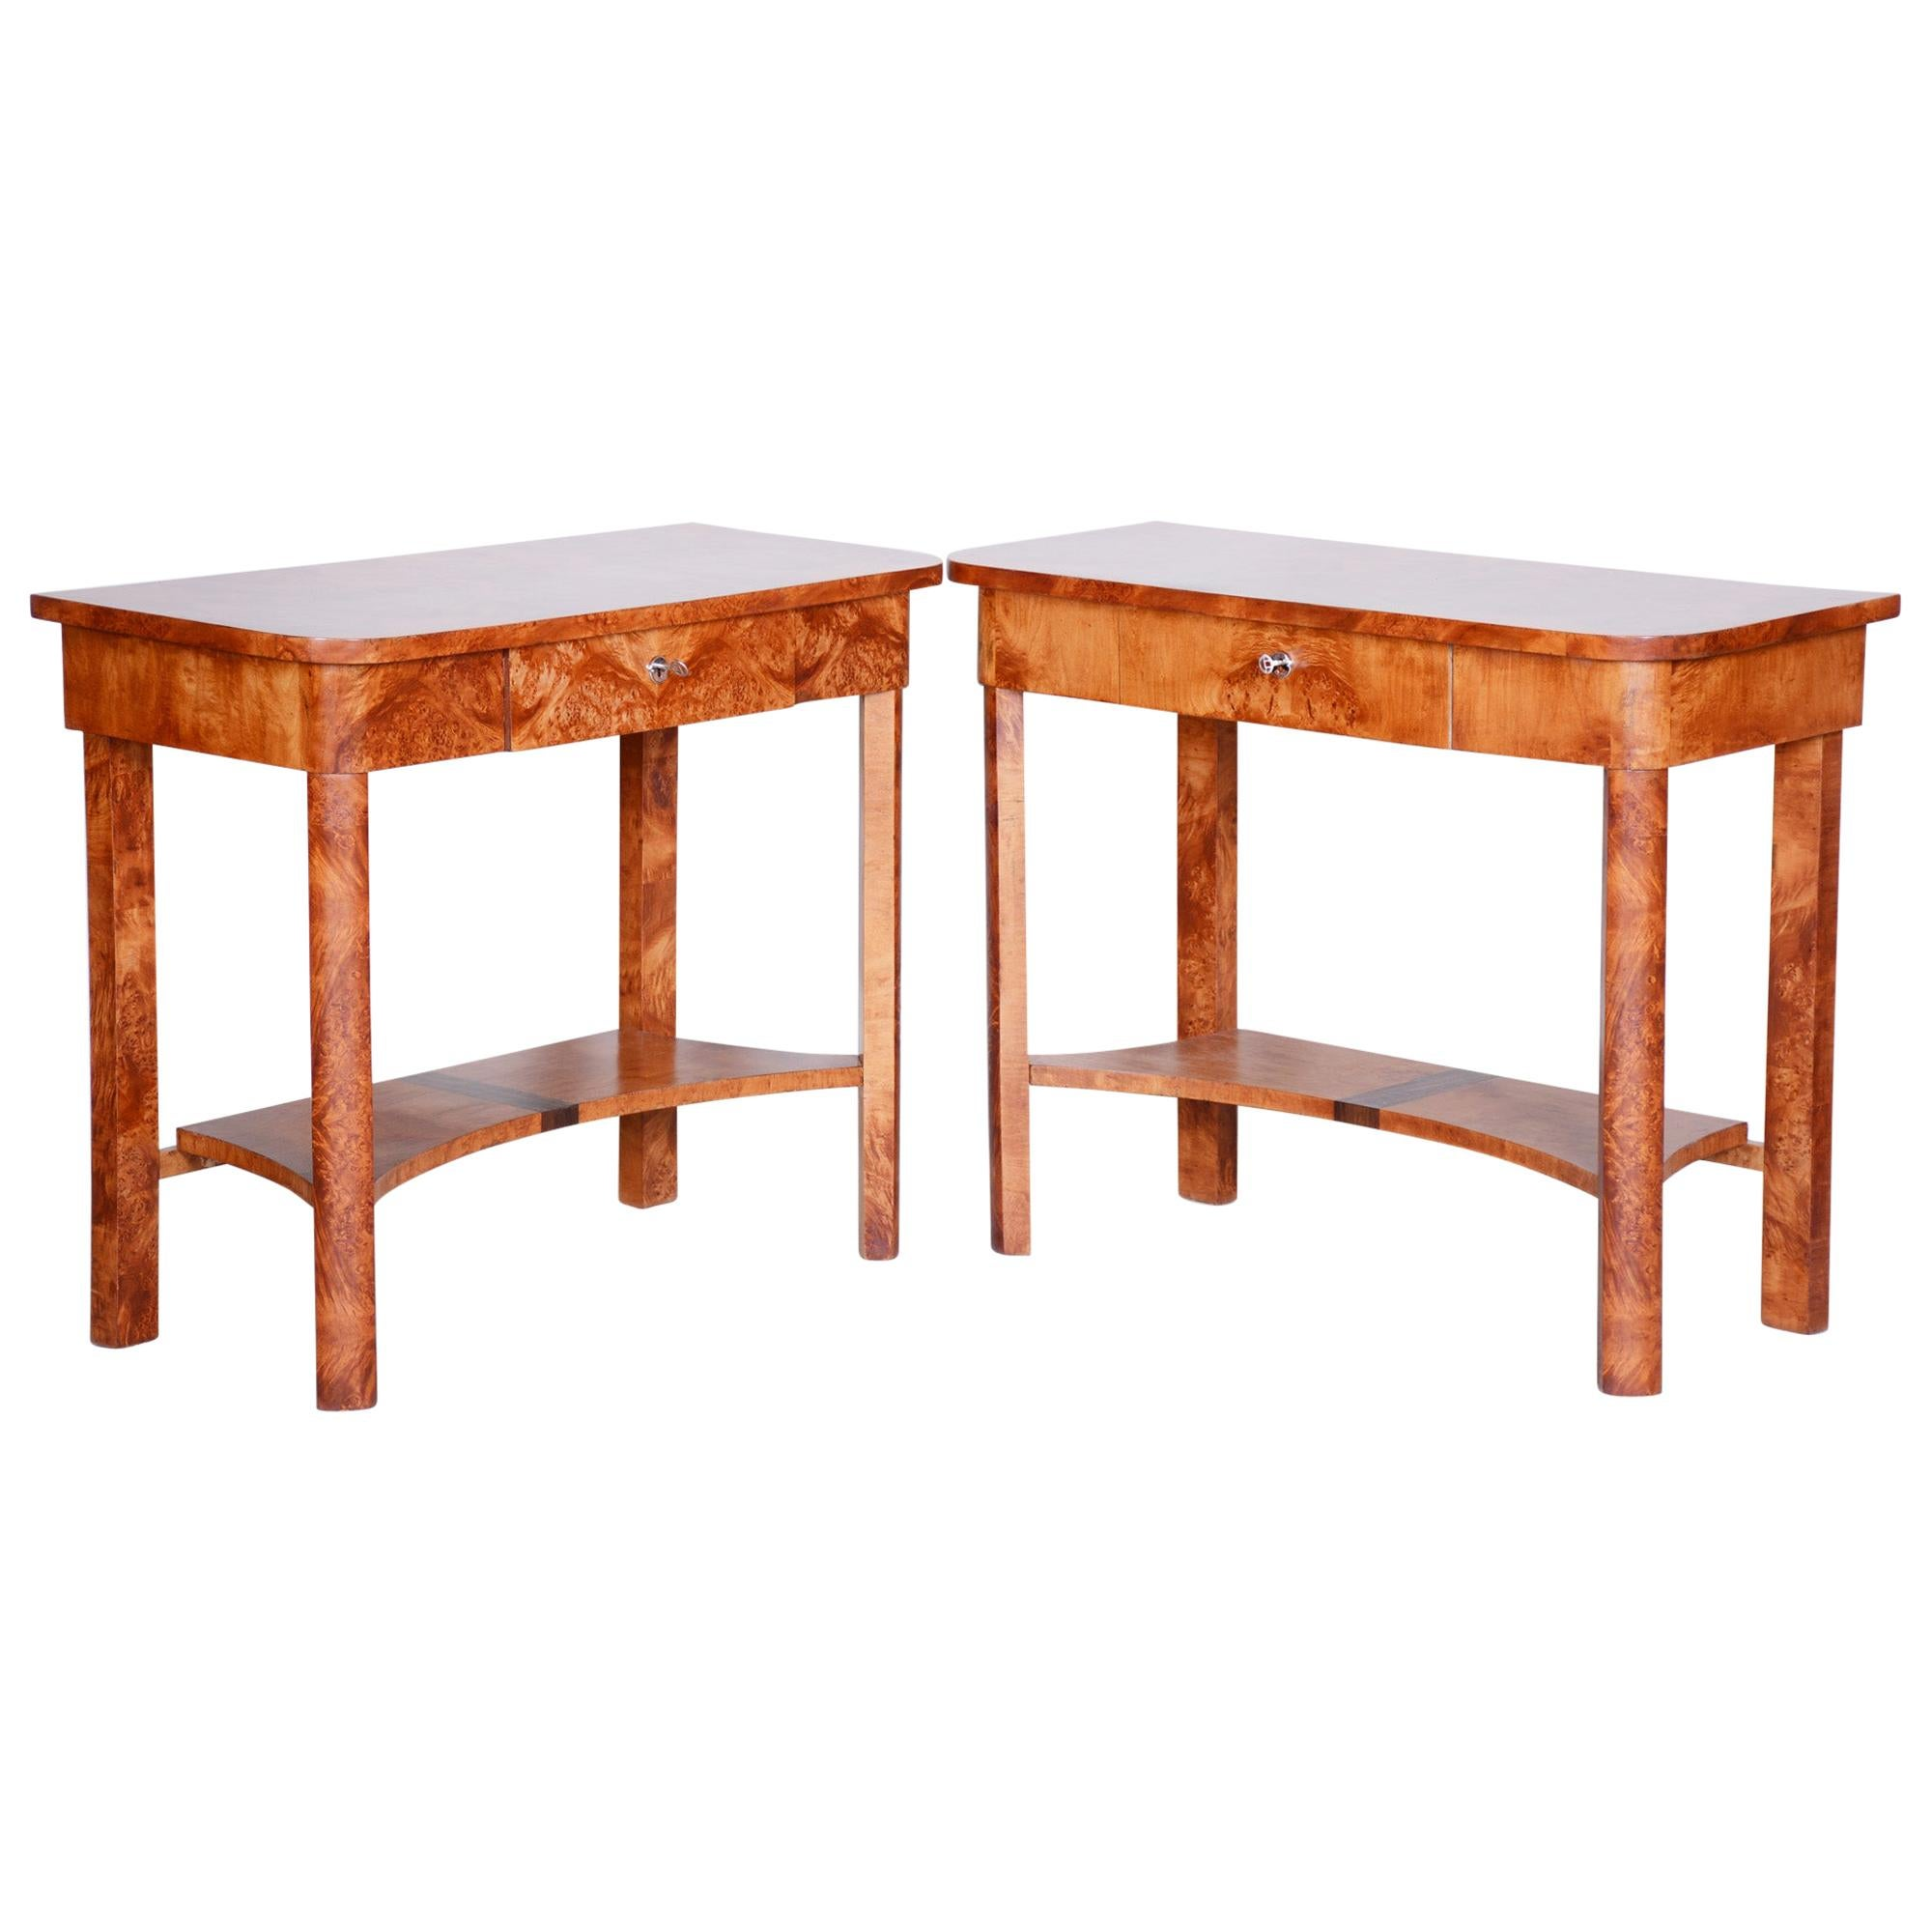 Completely Restored ArtDeco Pair of Brown Elm Side Tables, Czechia, 1920s